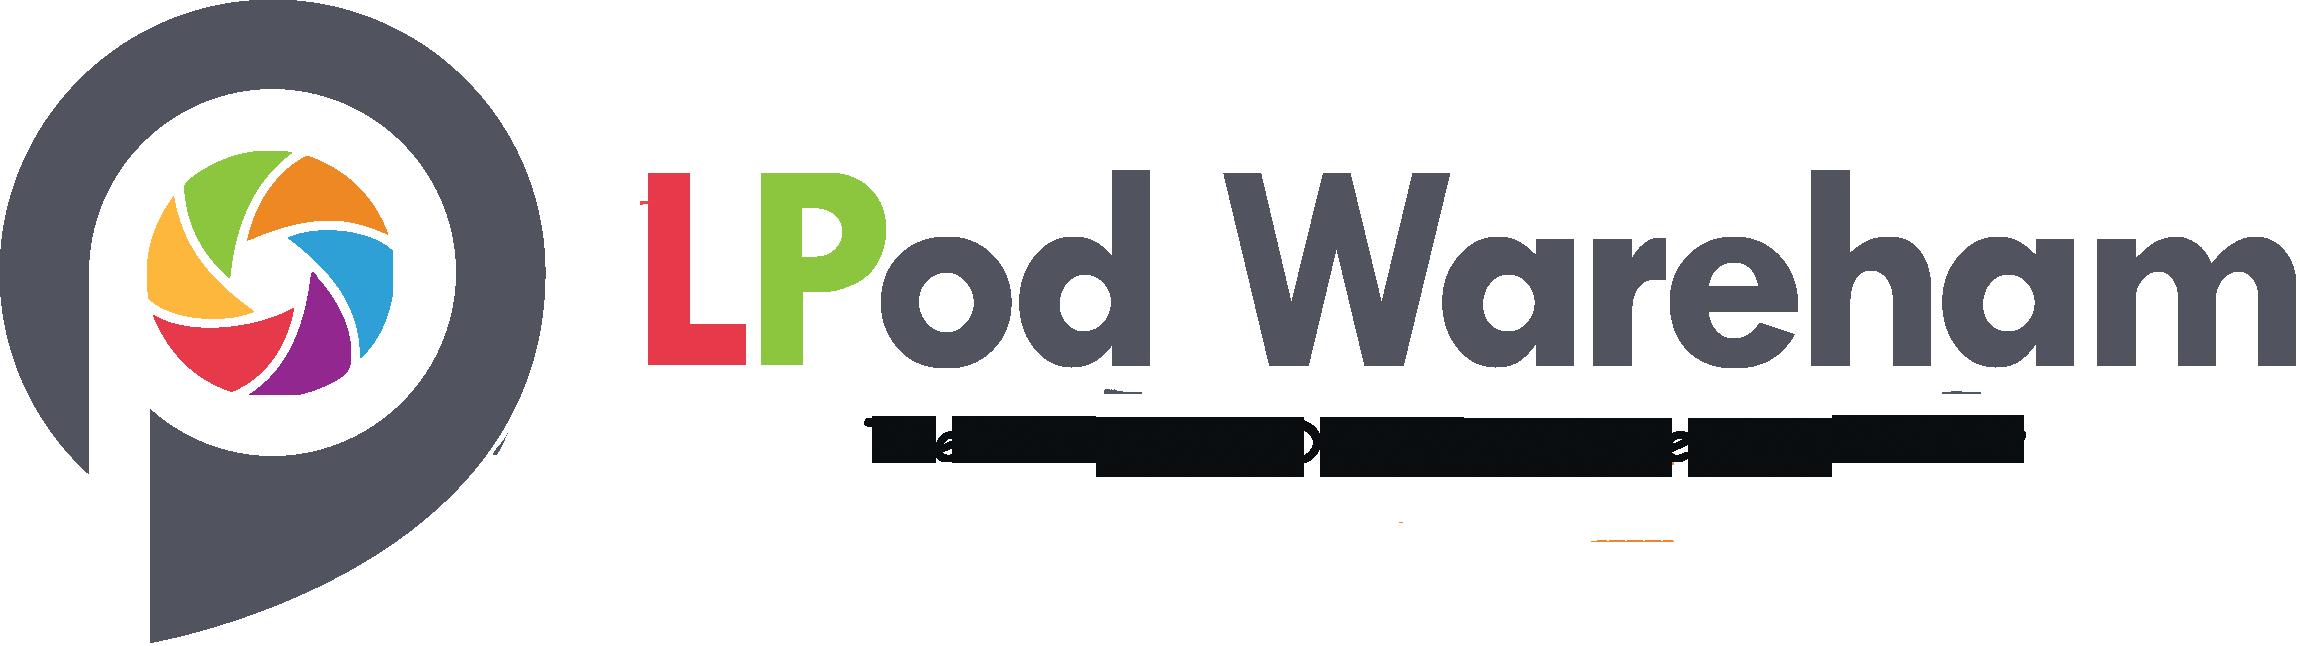 intensive driving courses wareham